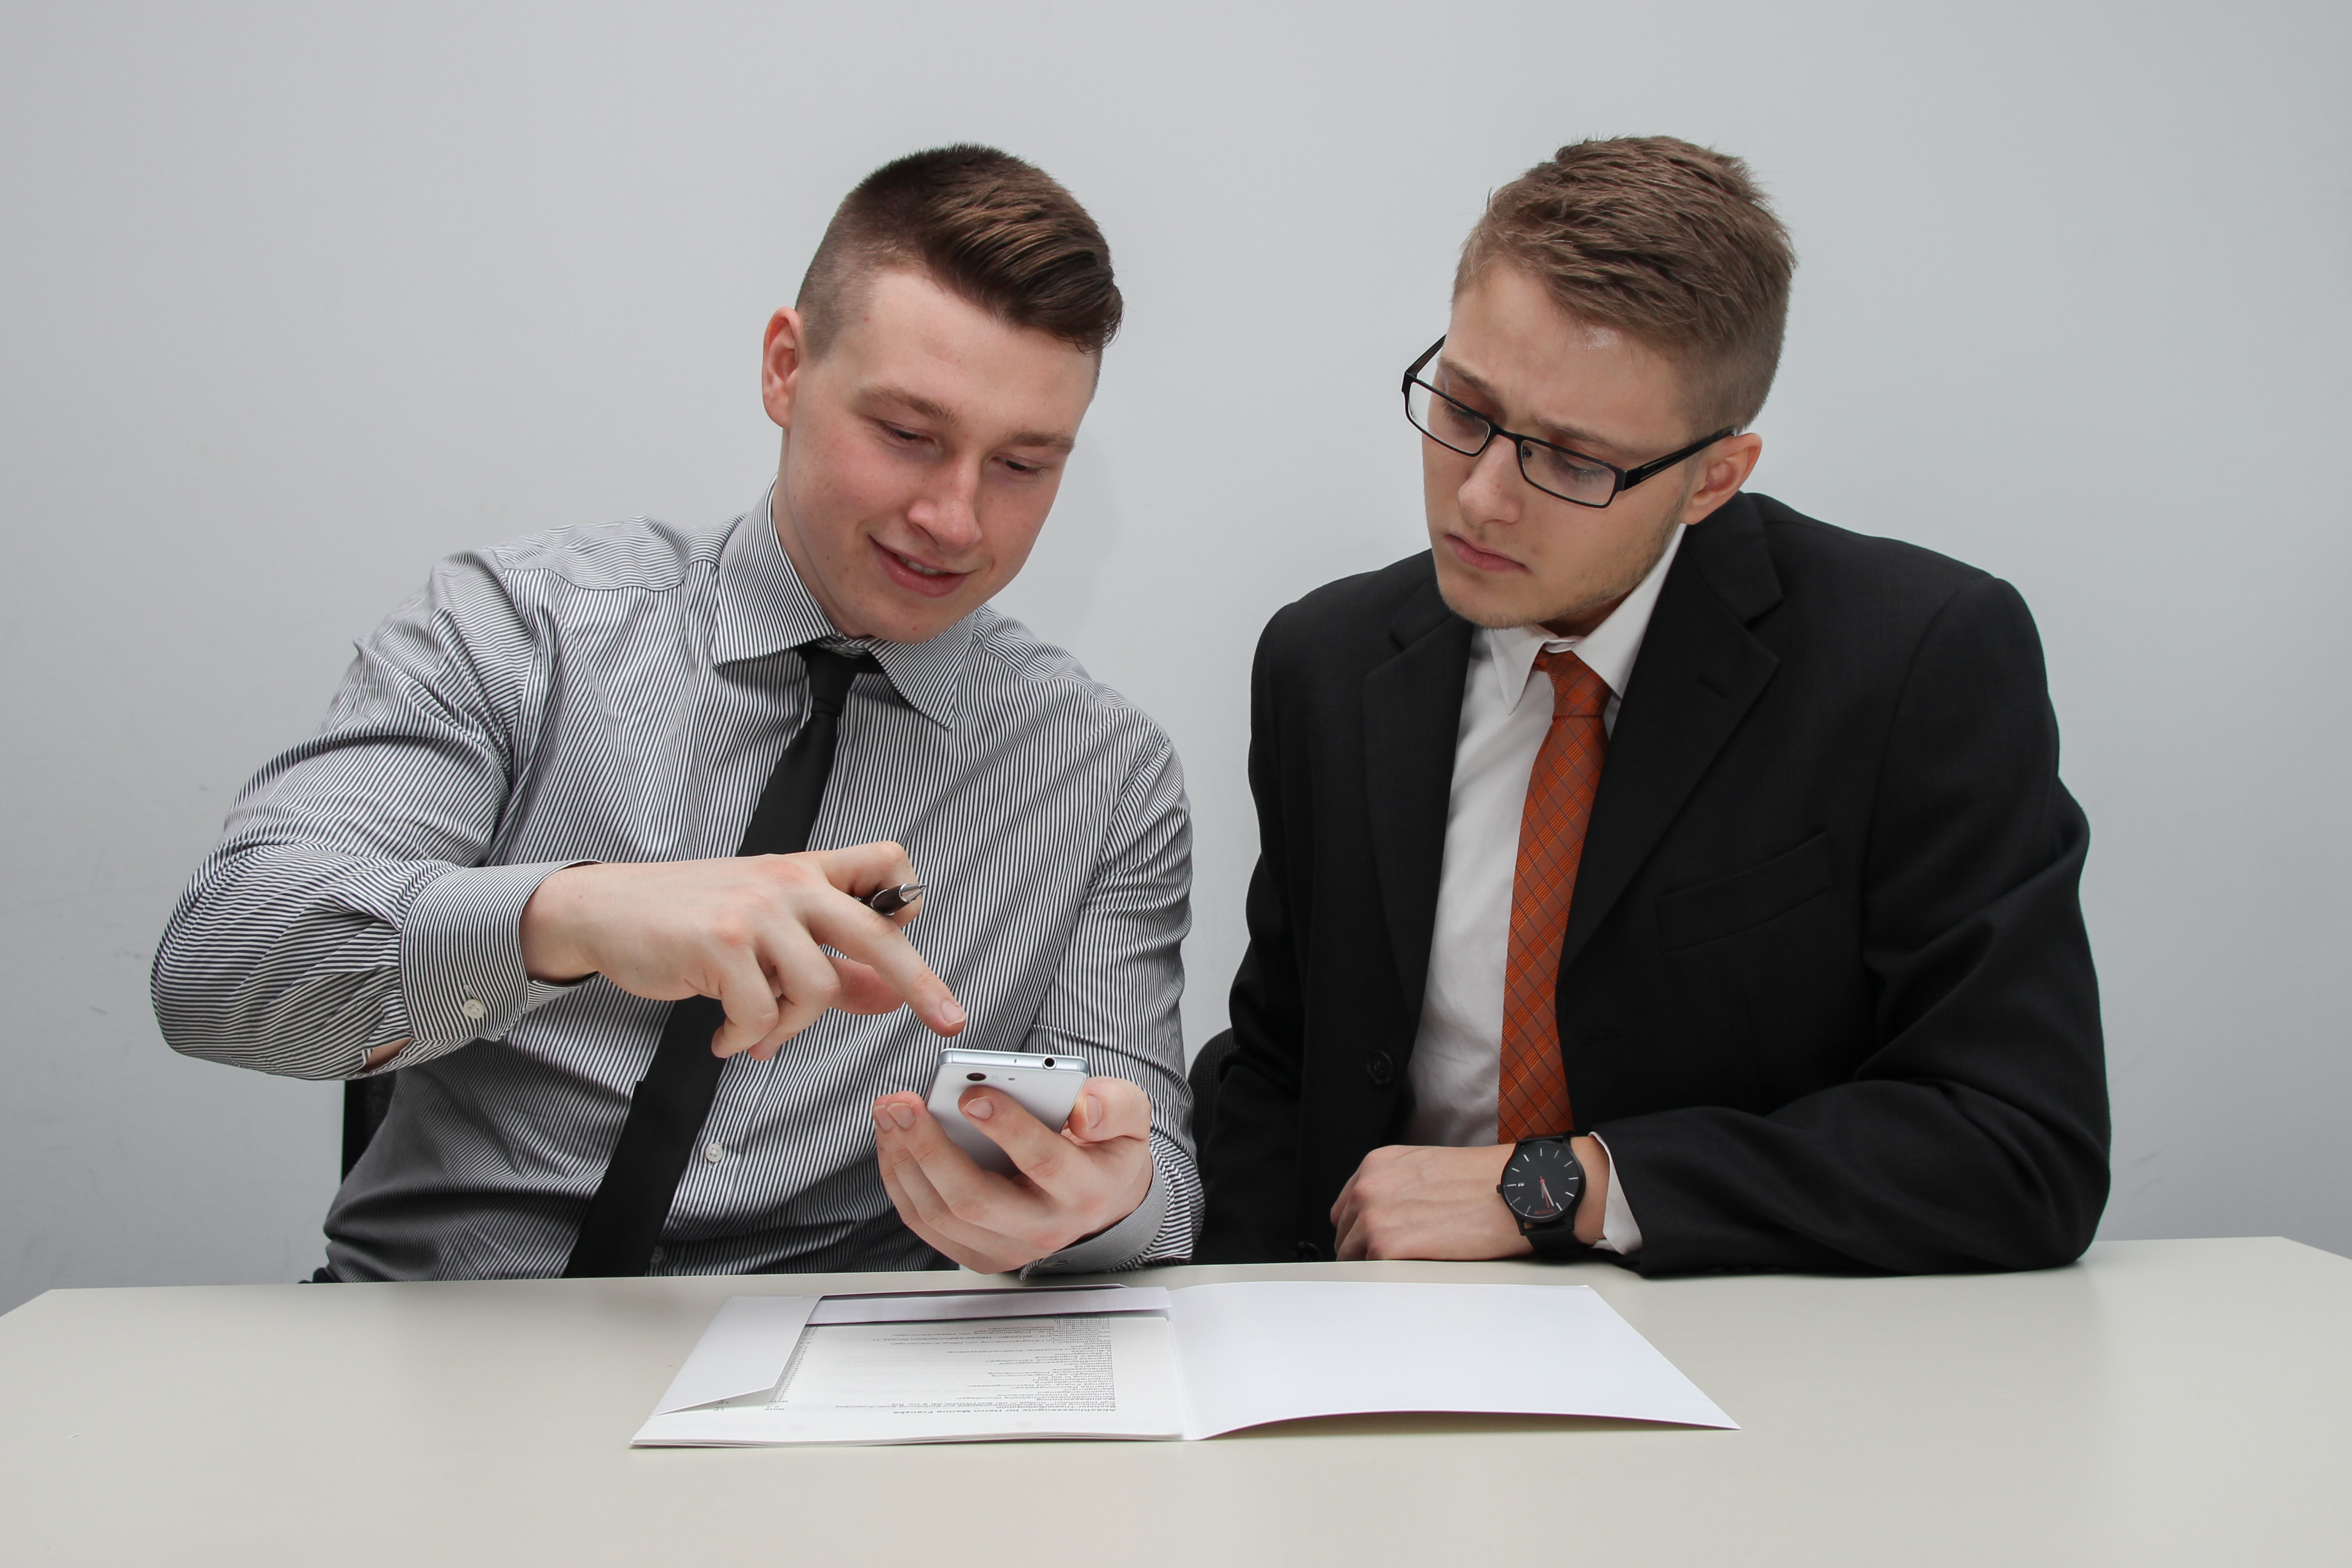 two-man-verifying